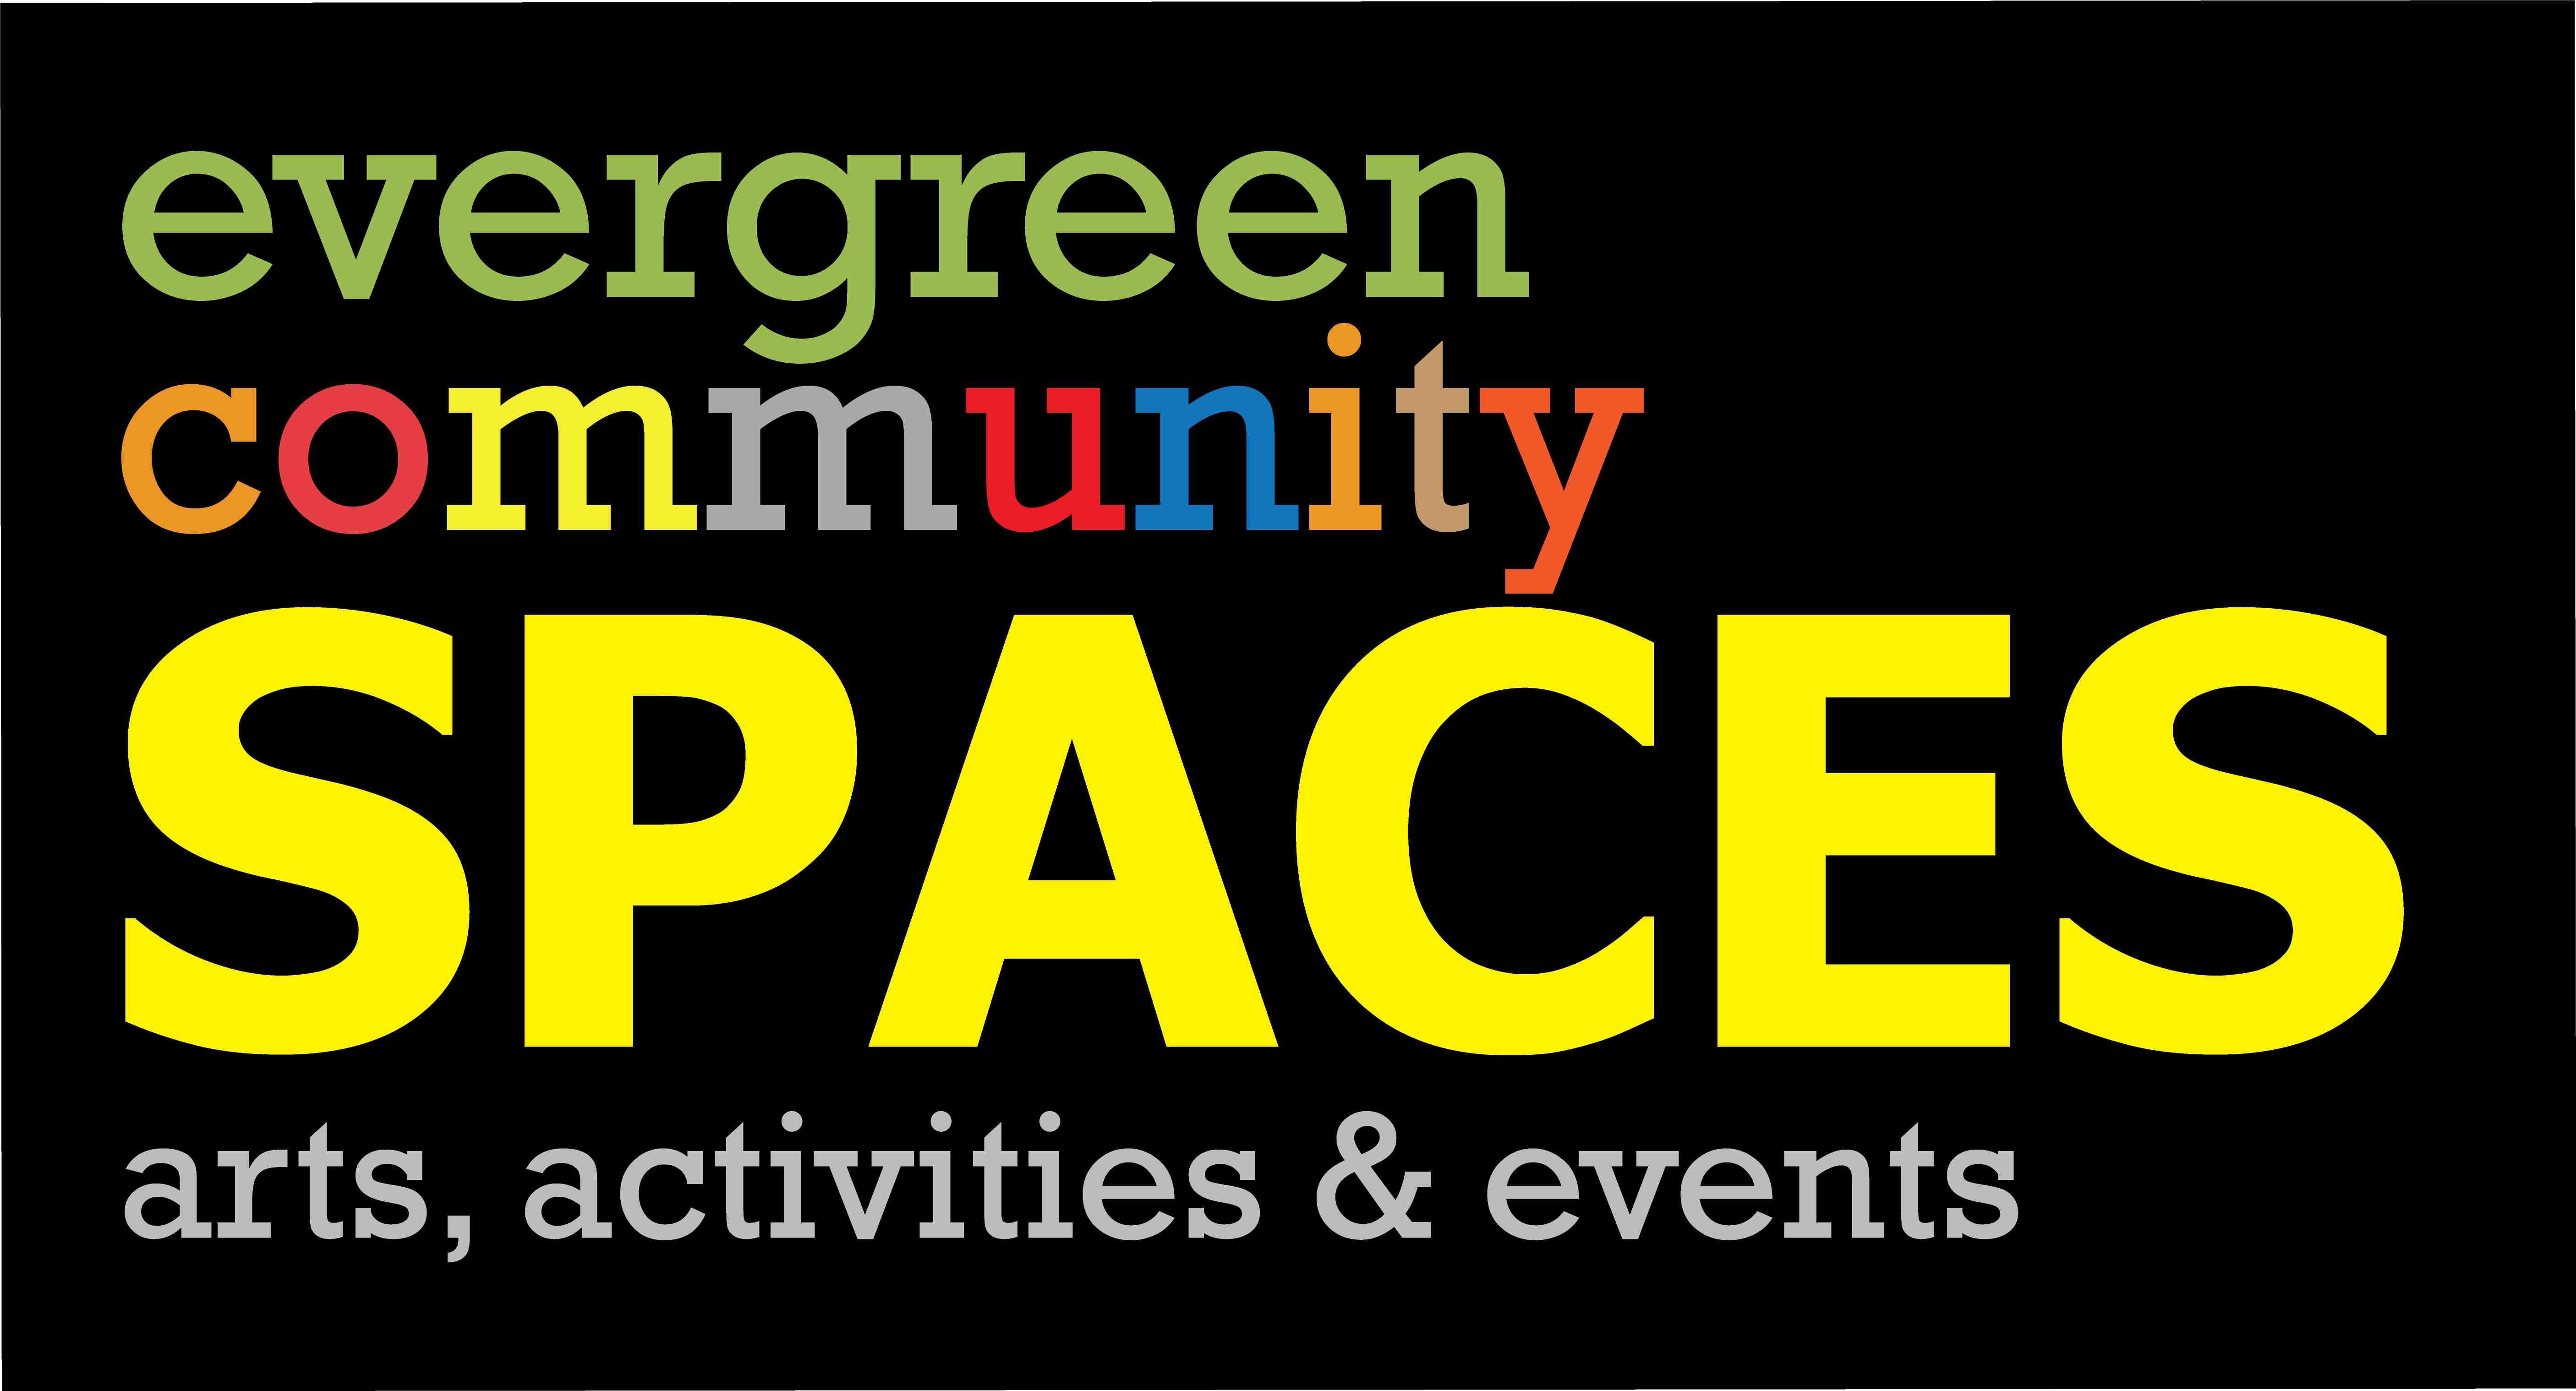 Evergreen Community Spaces